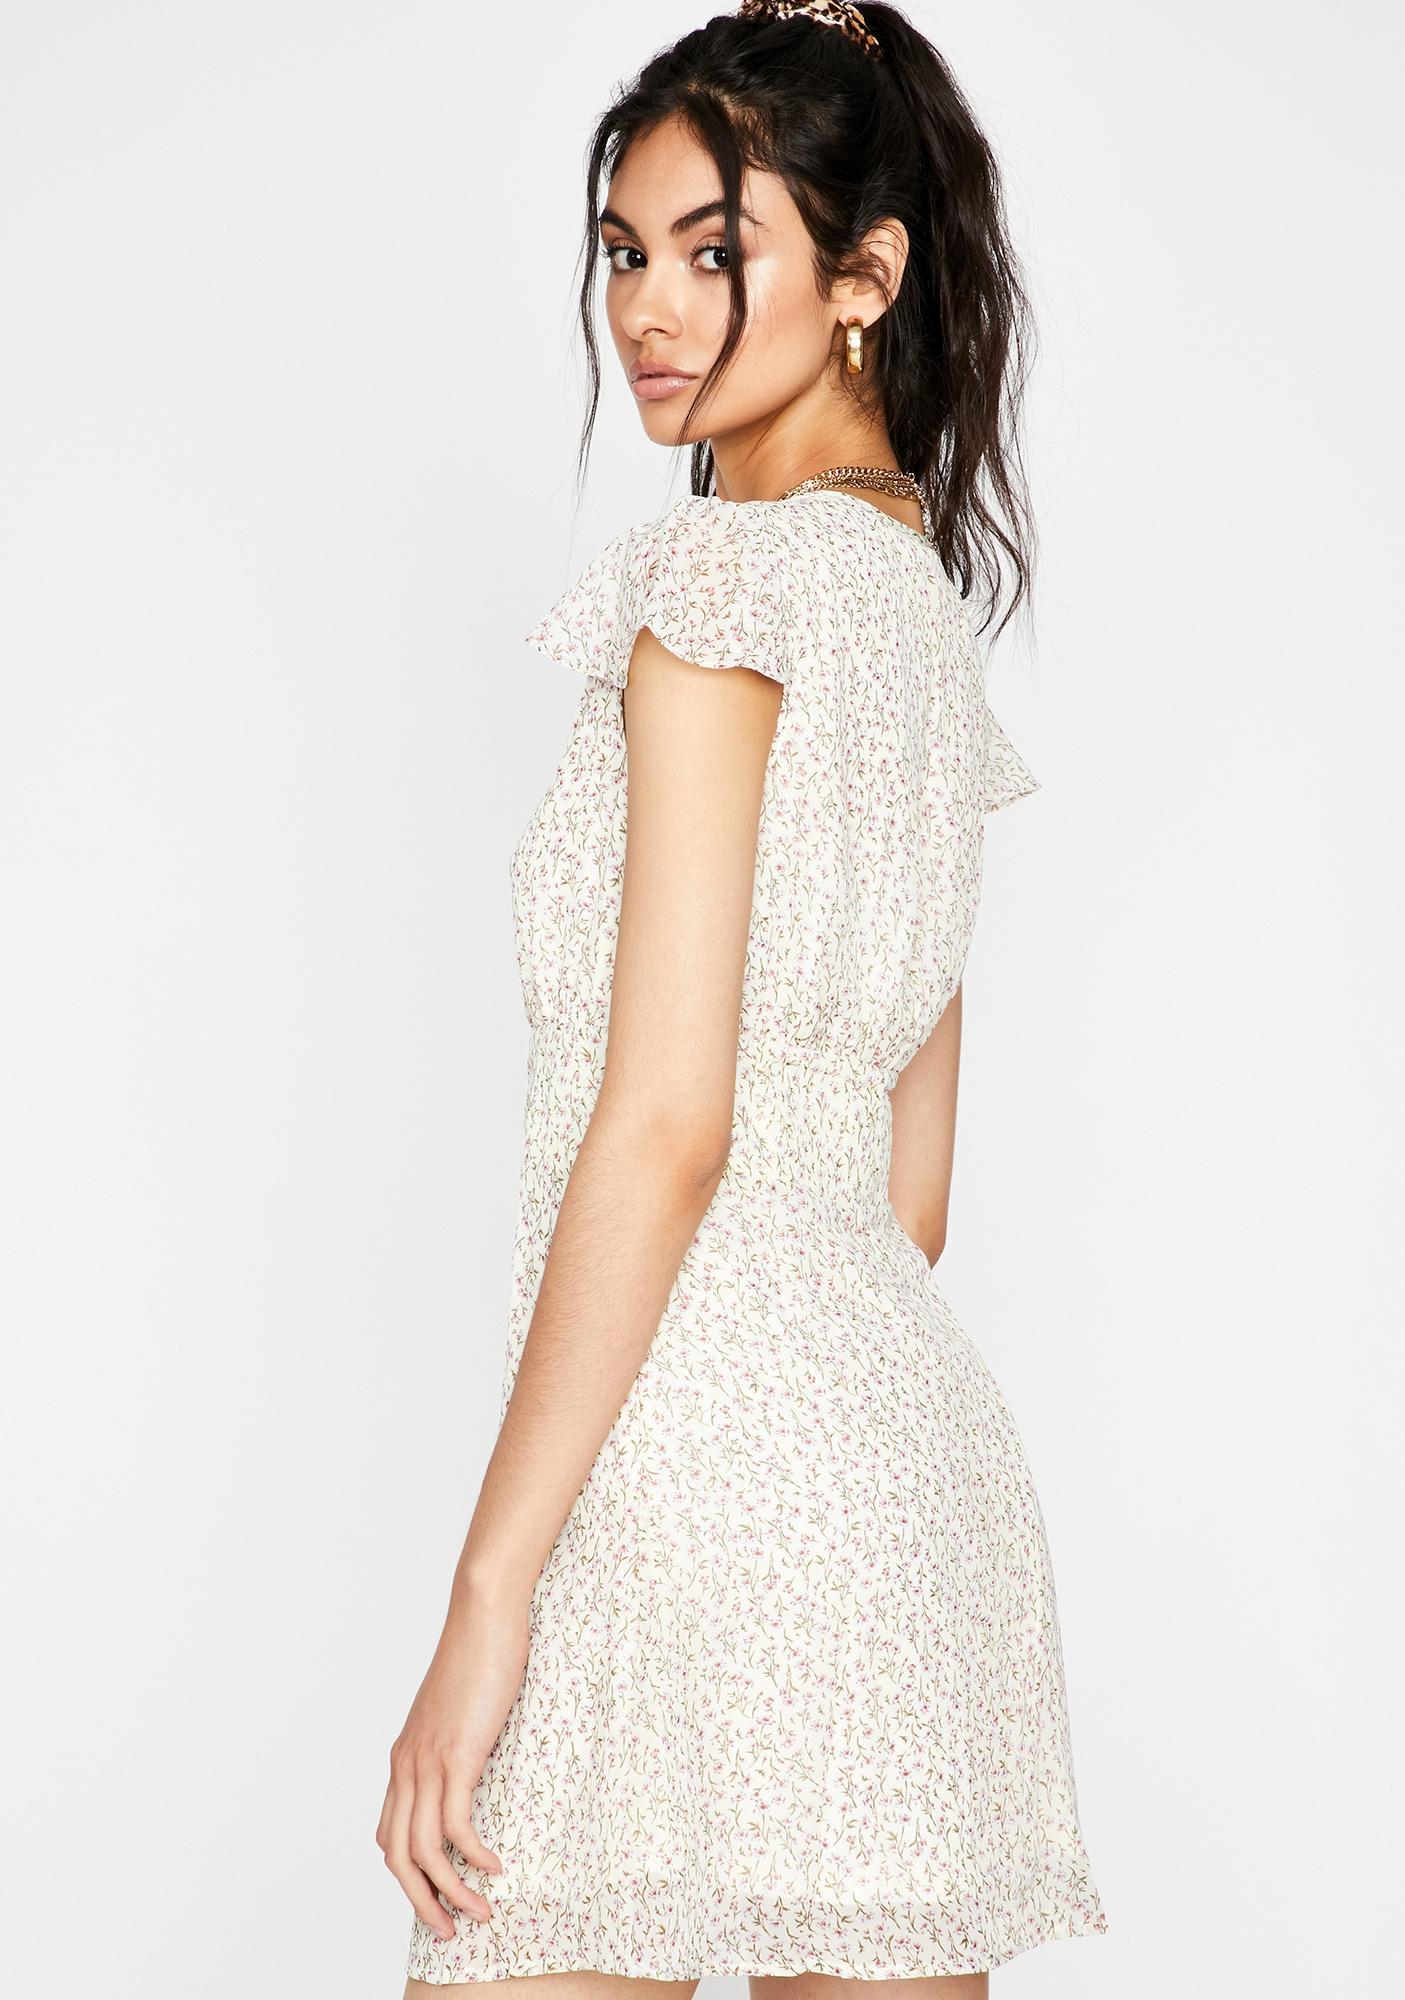 Cream Hopeful Romantic Floral Dress